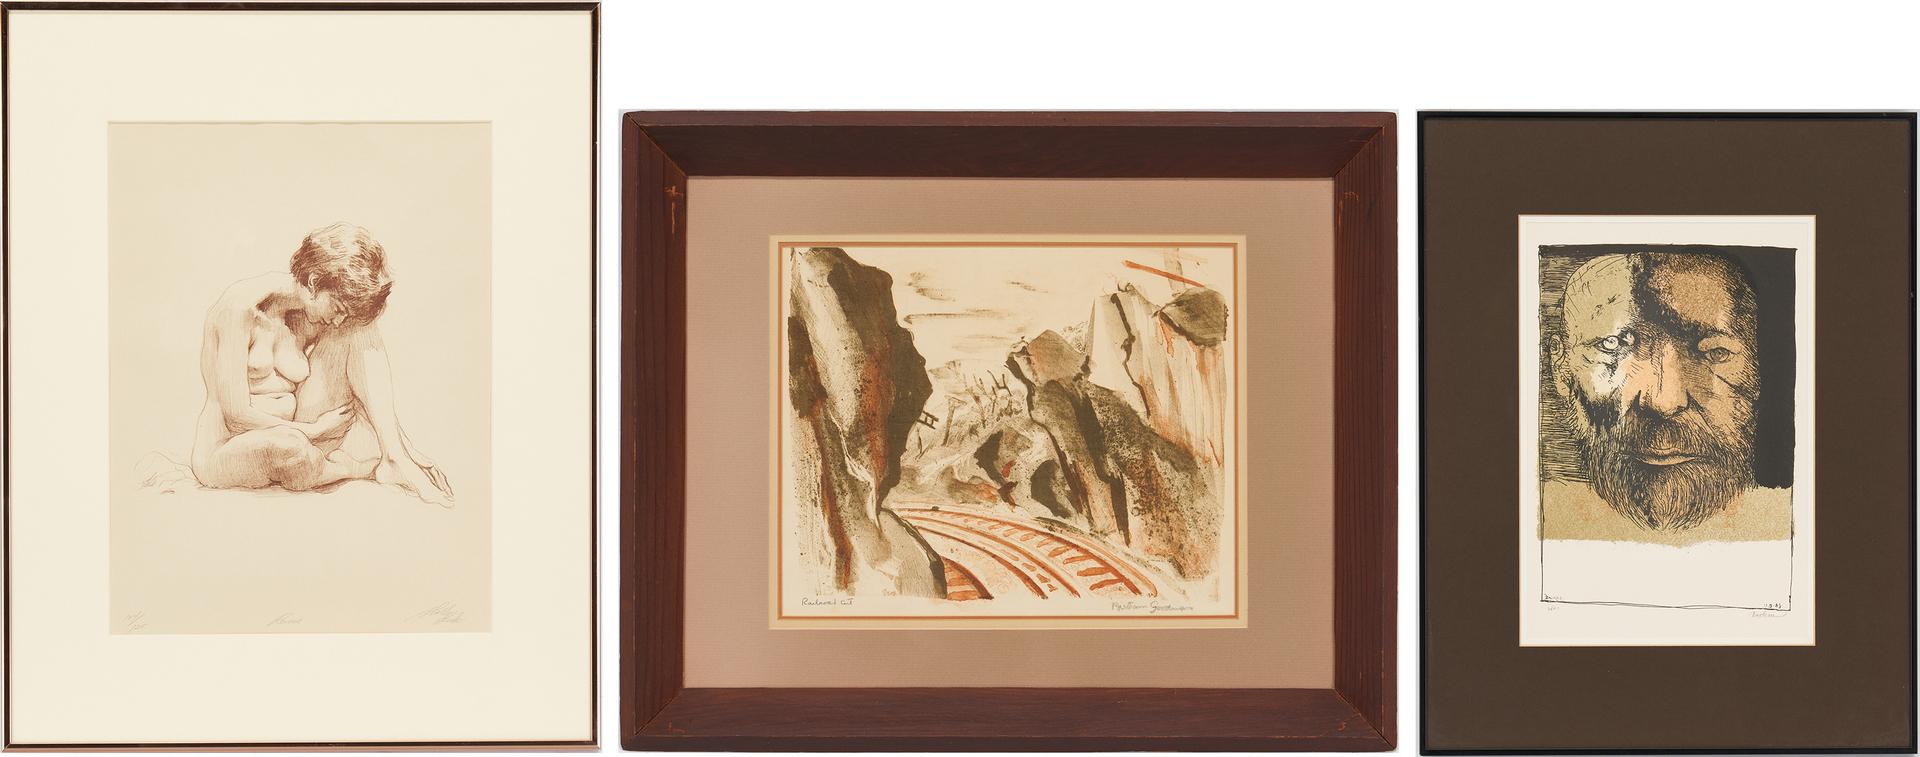 Lot 1153: 3 American Works on Paper, incl. Bertram Goodman, Leonard Baskin